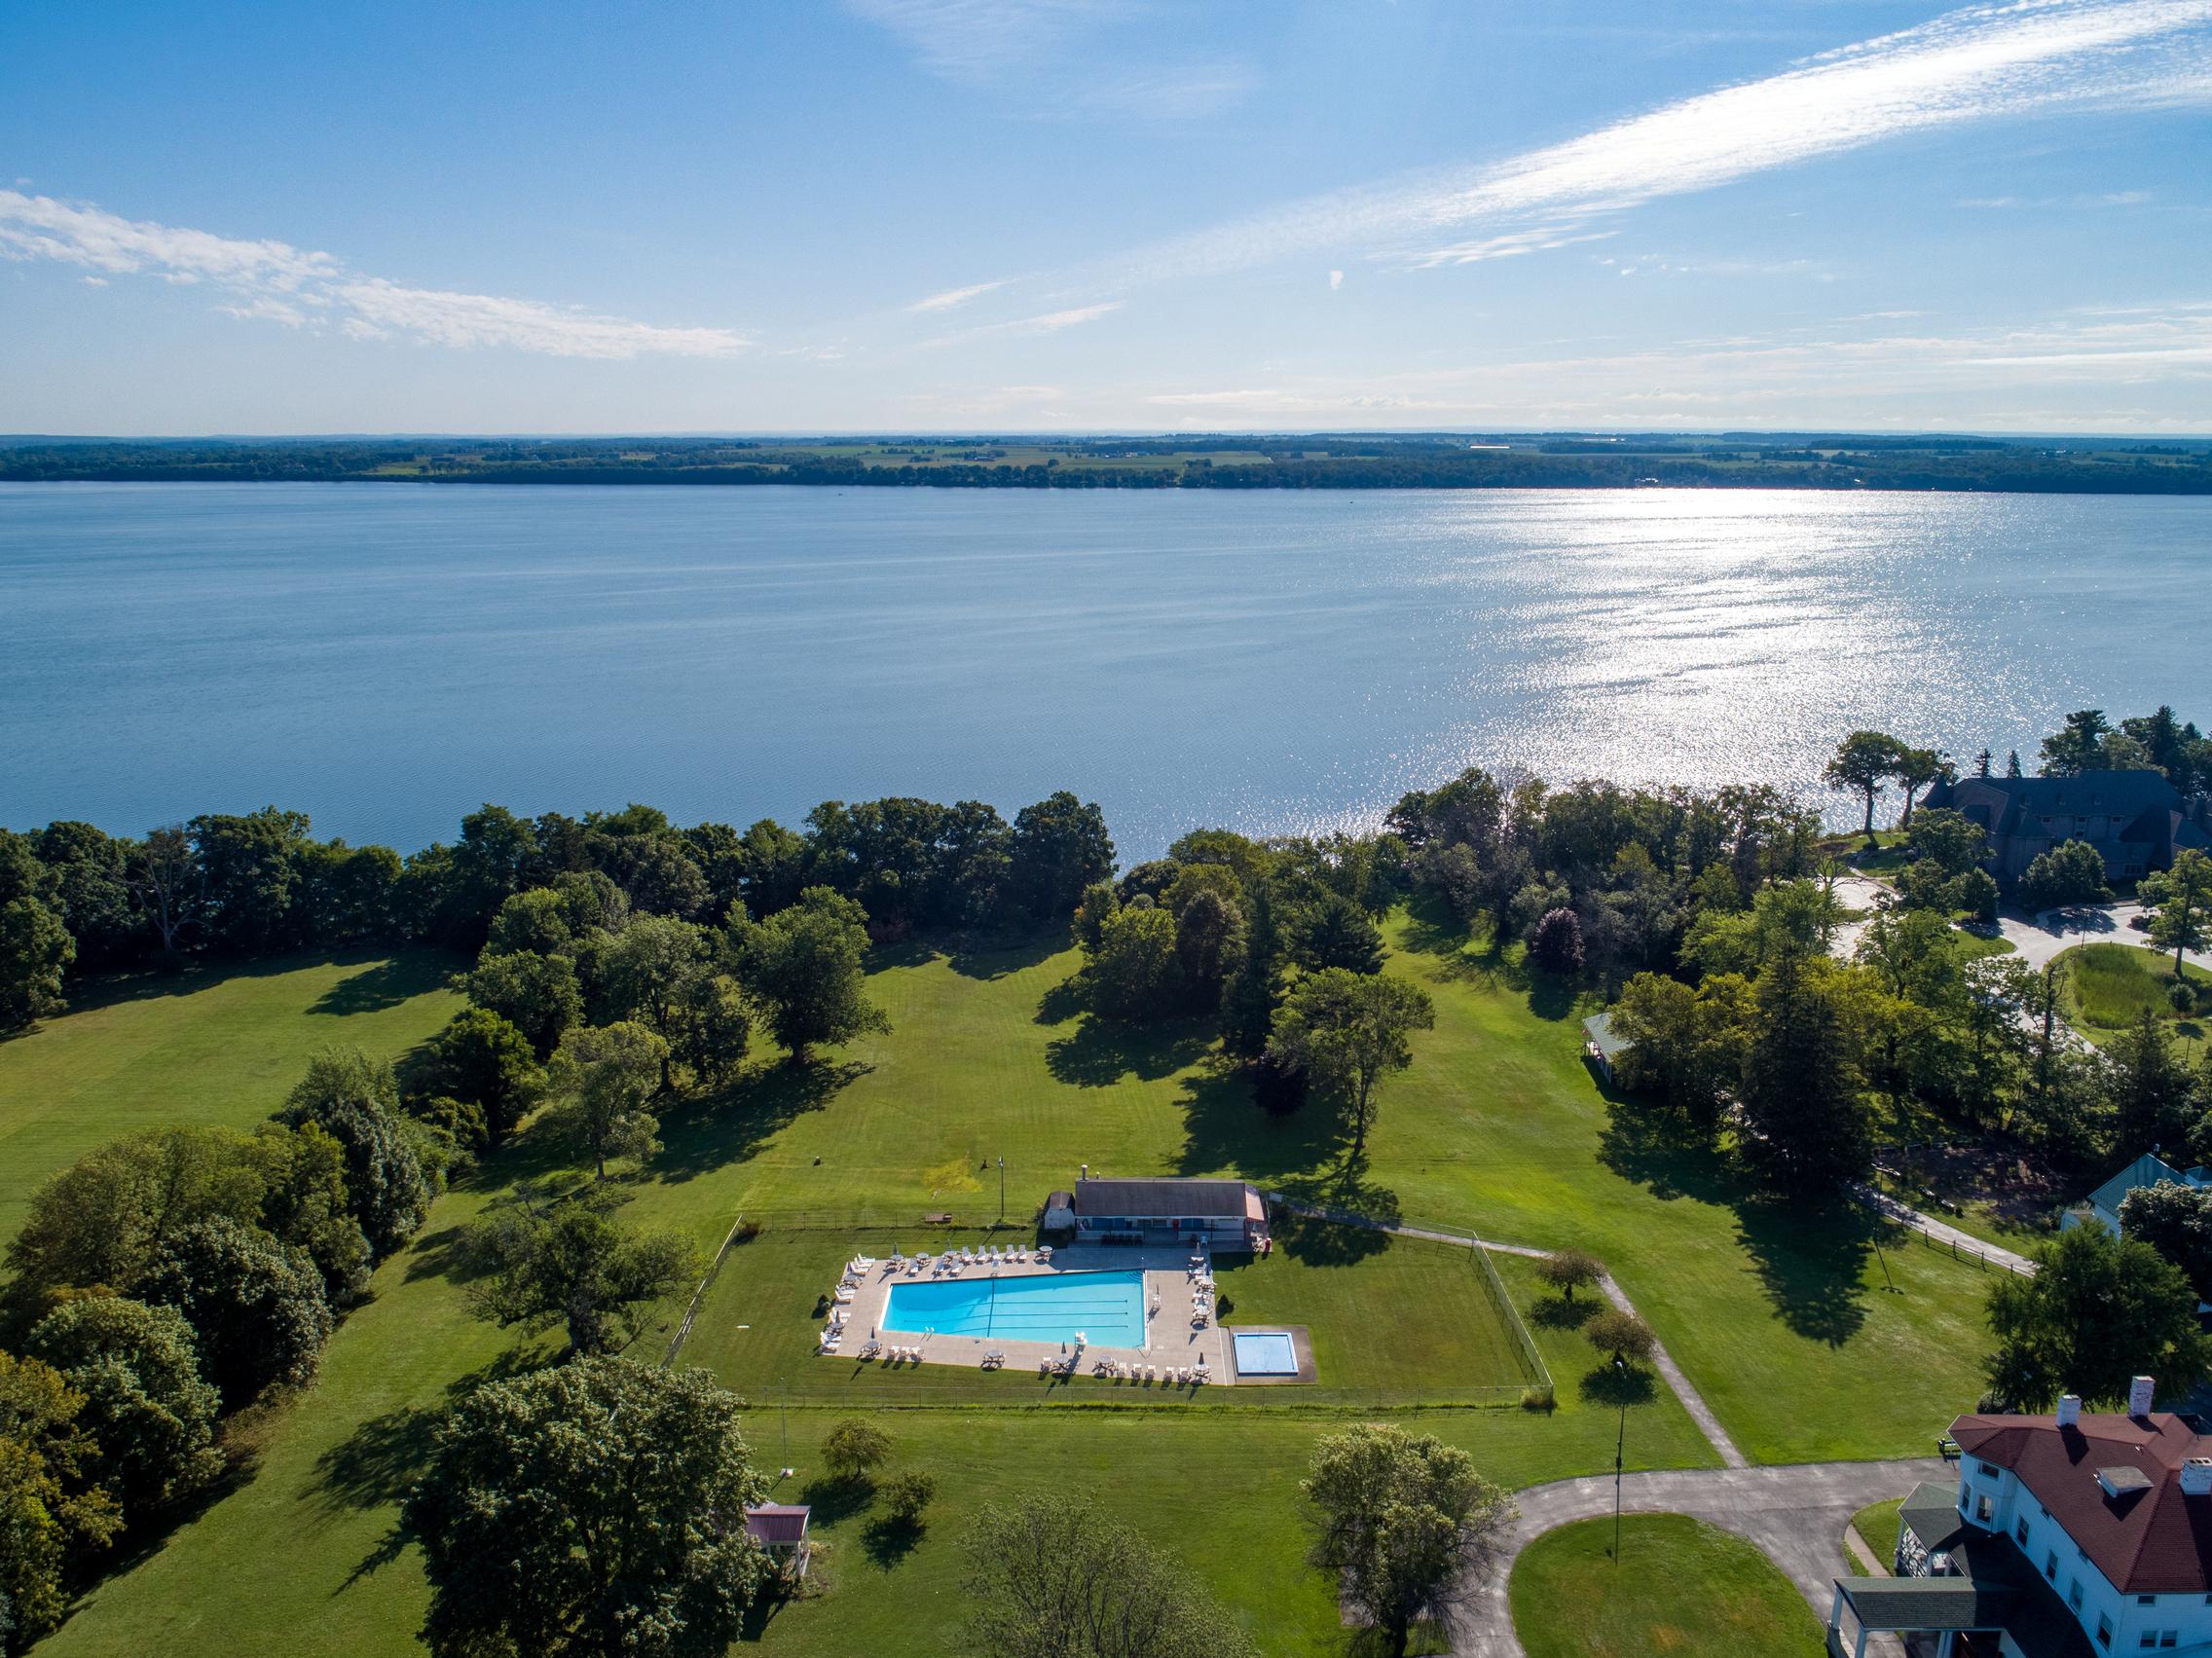 11 Seneca Lake Auction, American Legion, 1115 Lochland Rd, Geneva, NY 14456, Seneca Lake, Finger Lakes Property Listed For Sale by Michael DeRosa, Real Estate Broker, Michael DeRosa Exchange.JPG